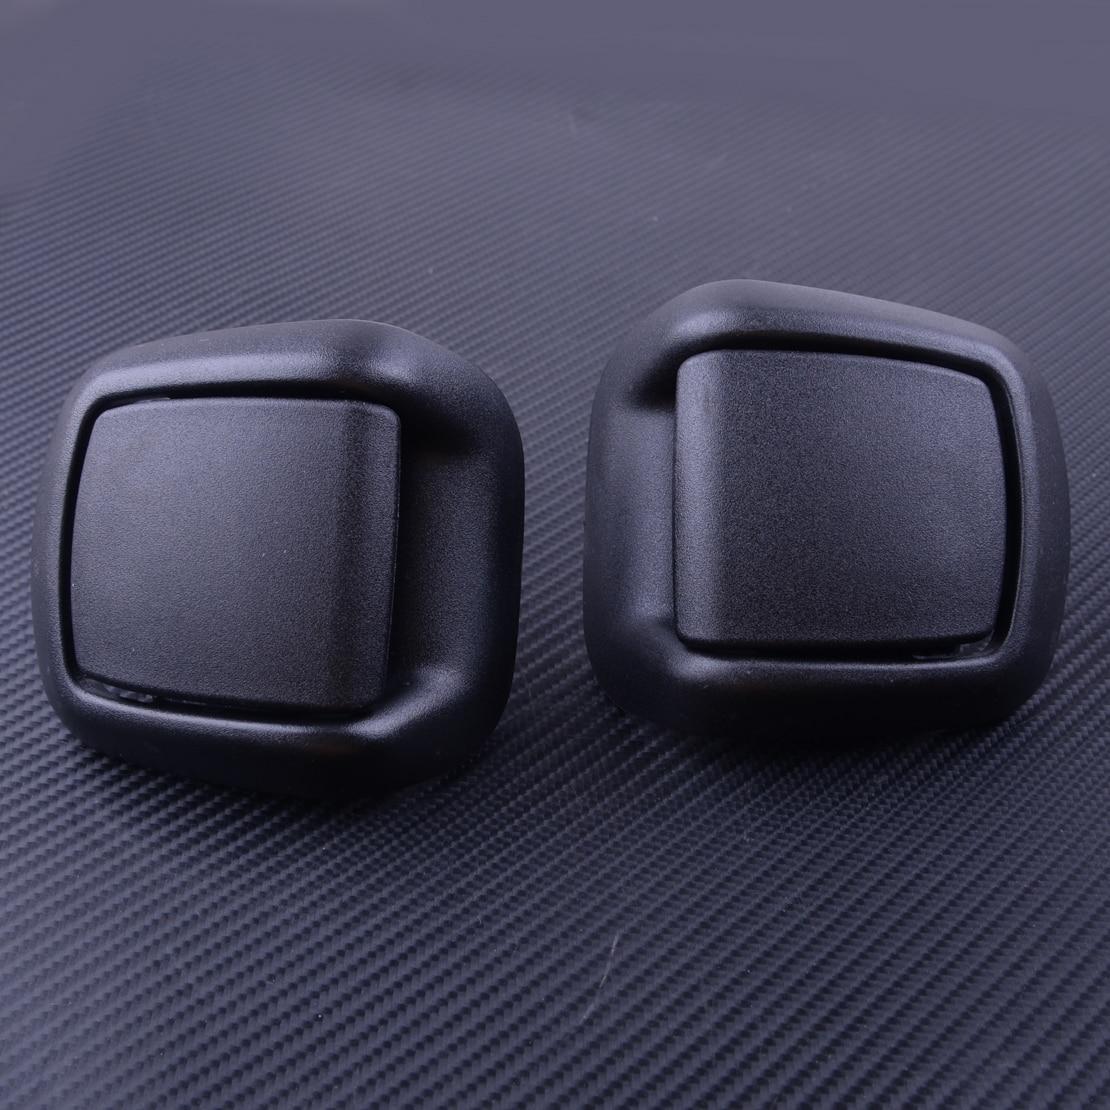 1417520 1417521 1Pair Car Front Right Left Seat Tilt Handle Fit For Ford Fiesta MK6 VI 3 Door 2002 2003 2004 2005 2006 2007 2008